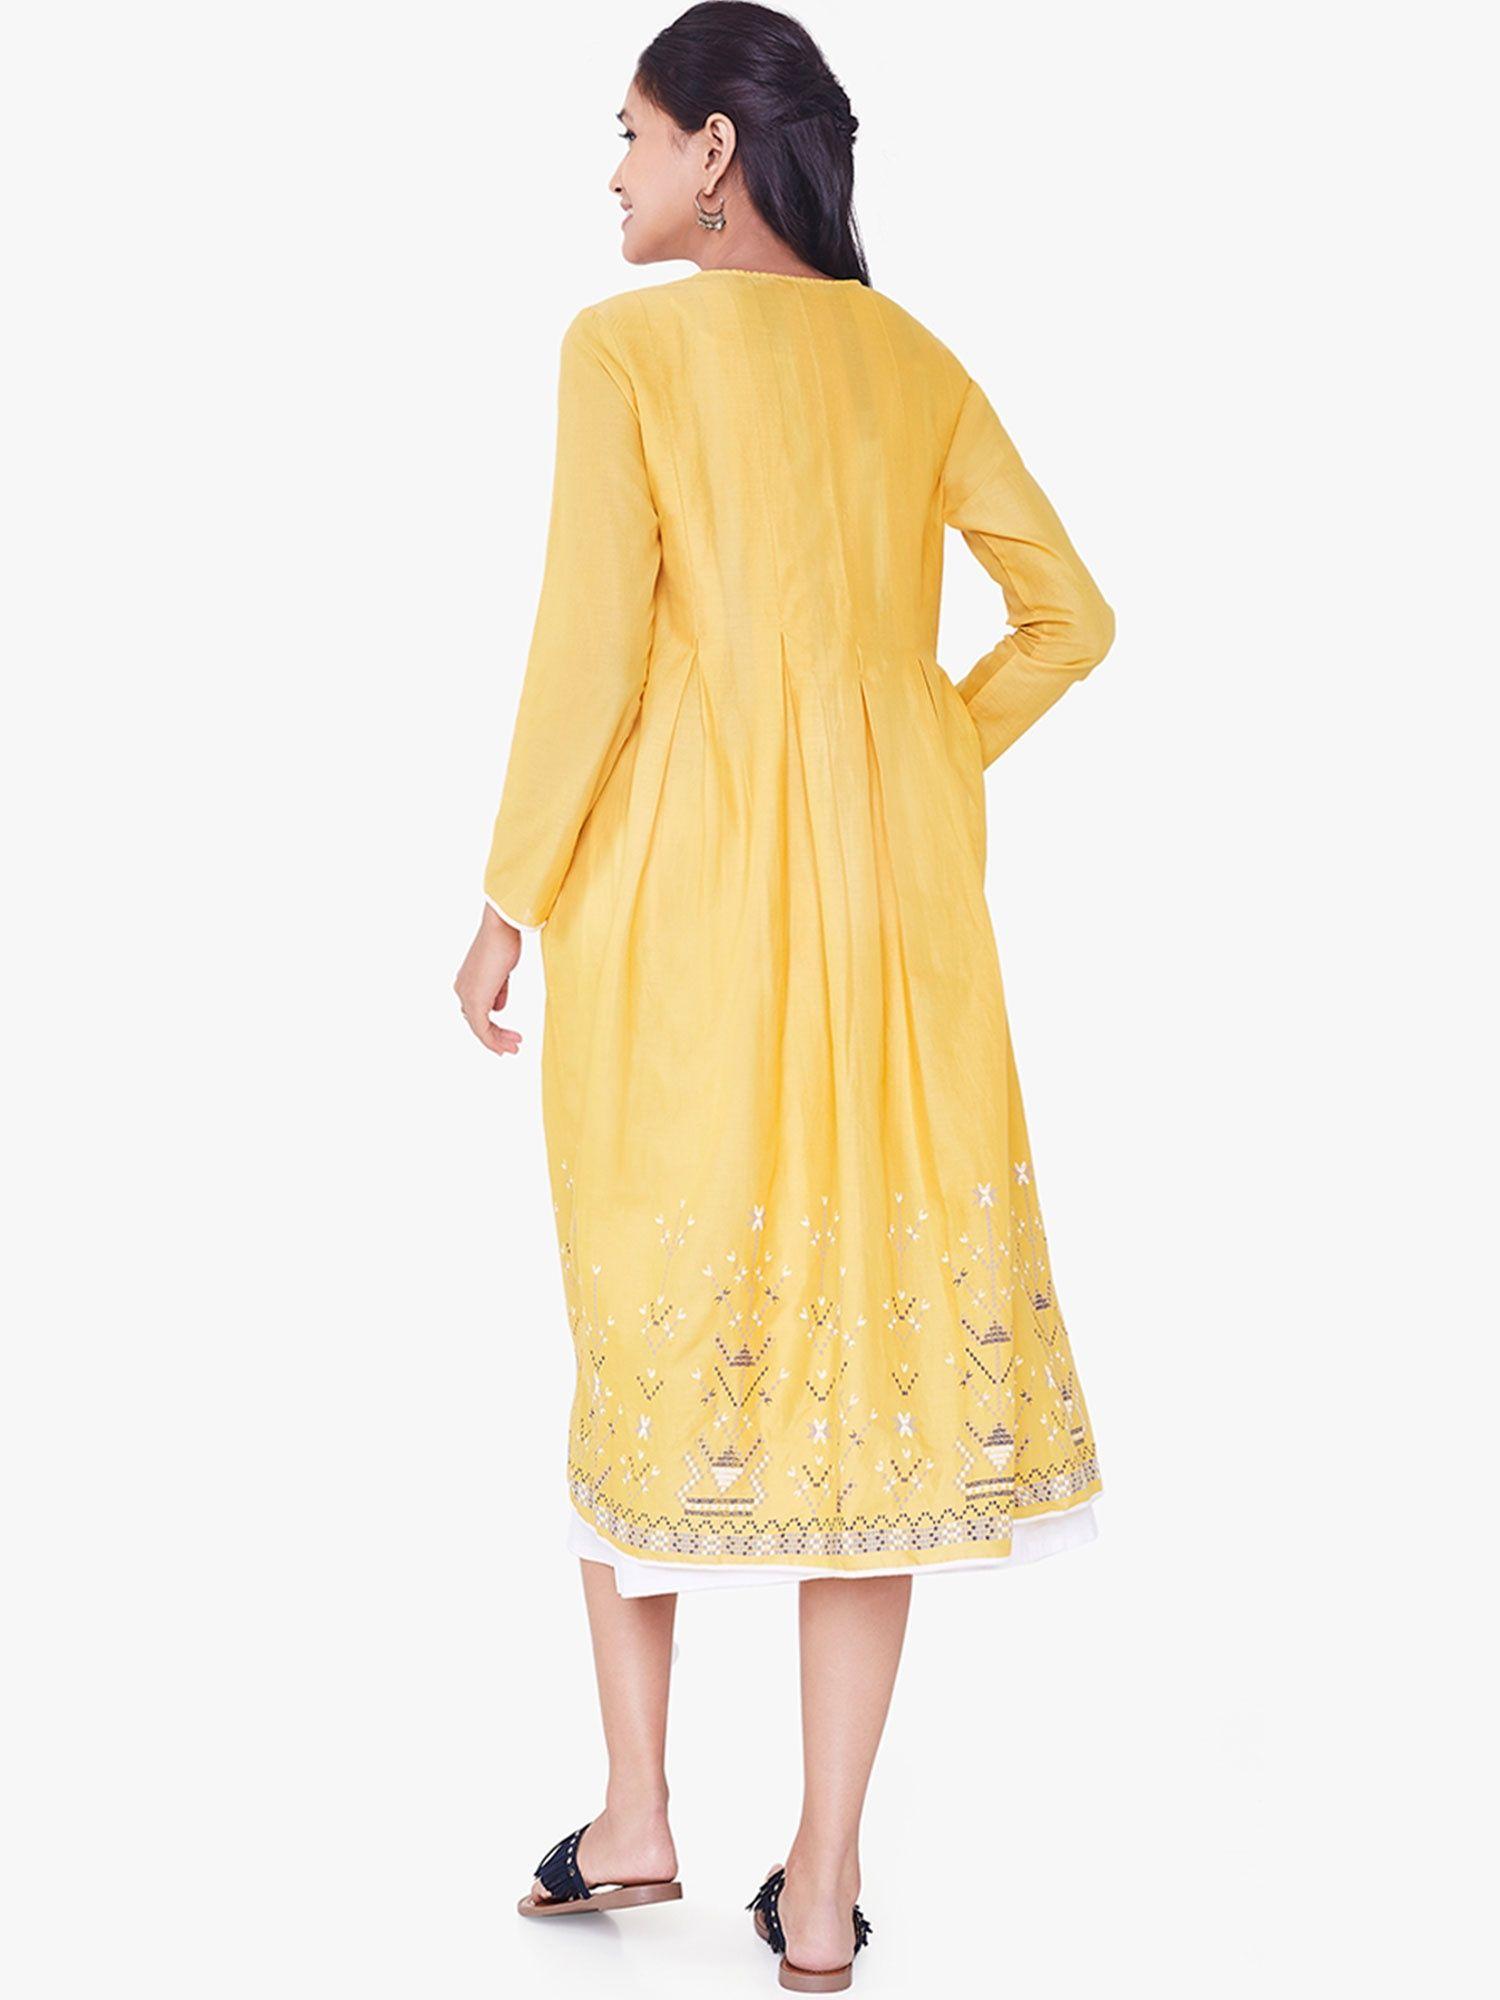 463fa51f5d5 Global Desi Tunics,Kurtis Kurtas and Tunics : Buy Global Desi ...